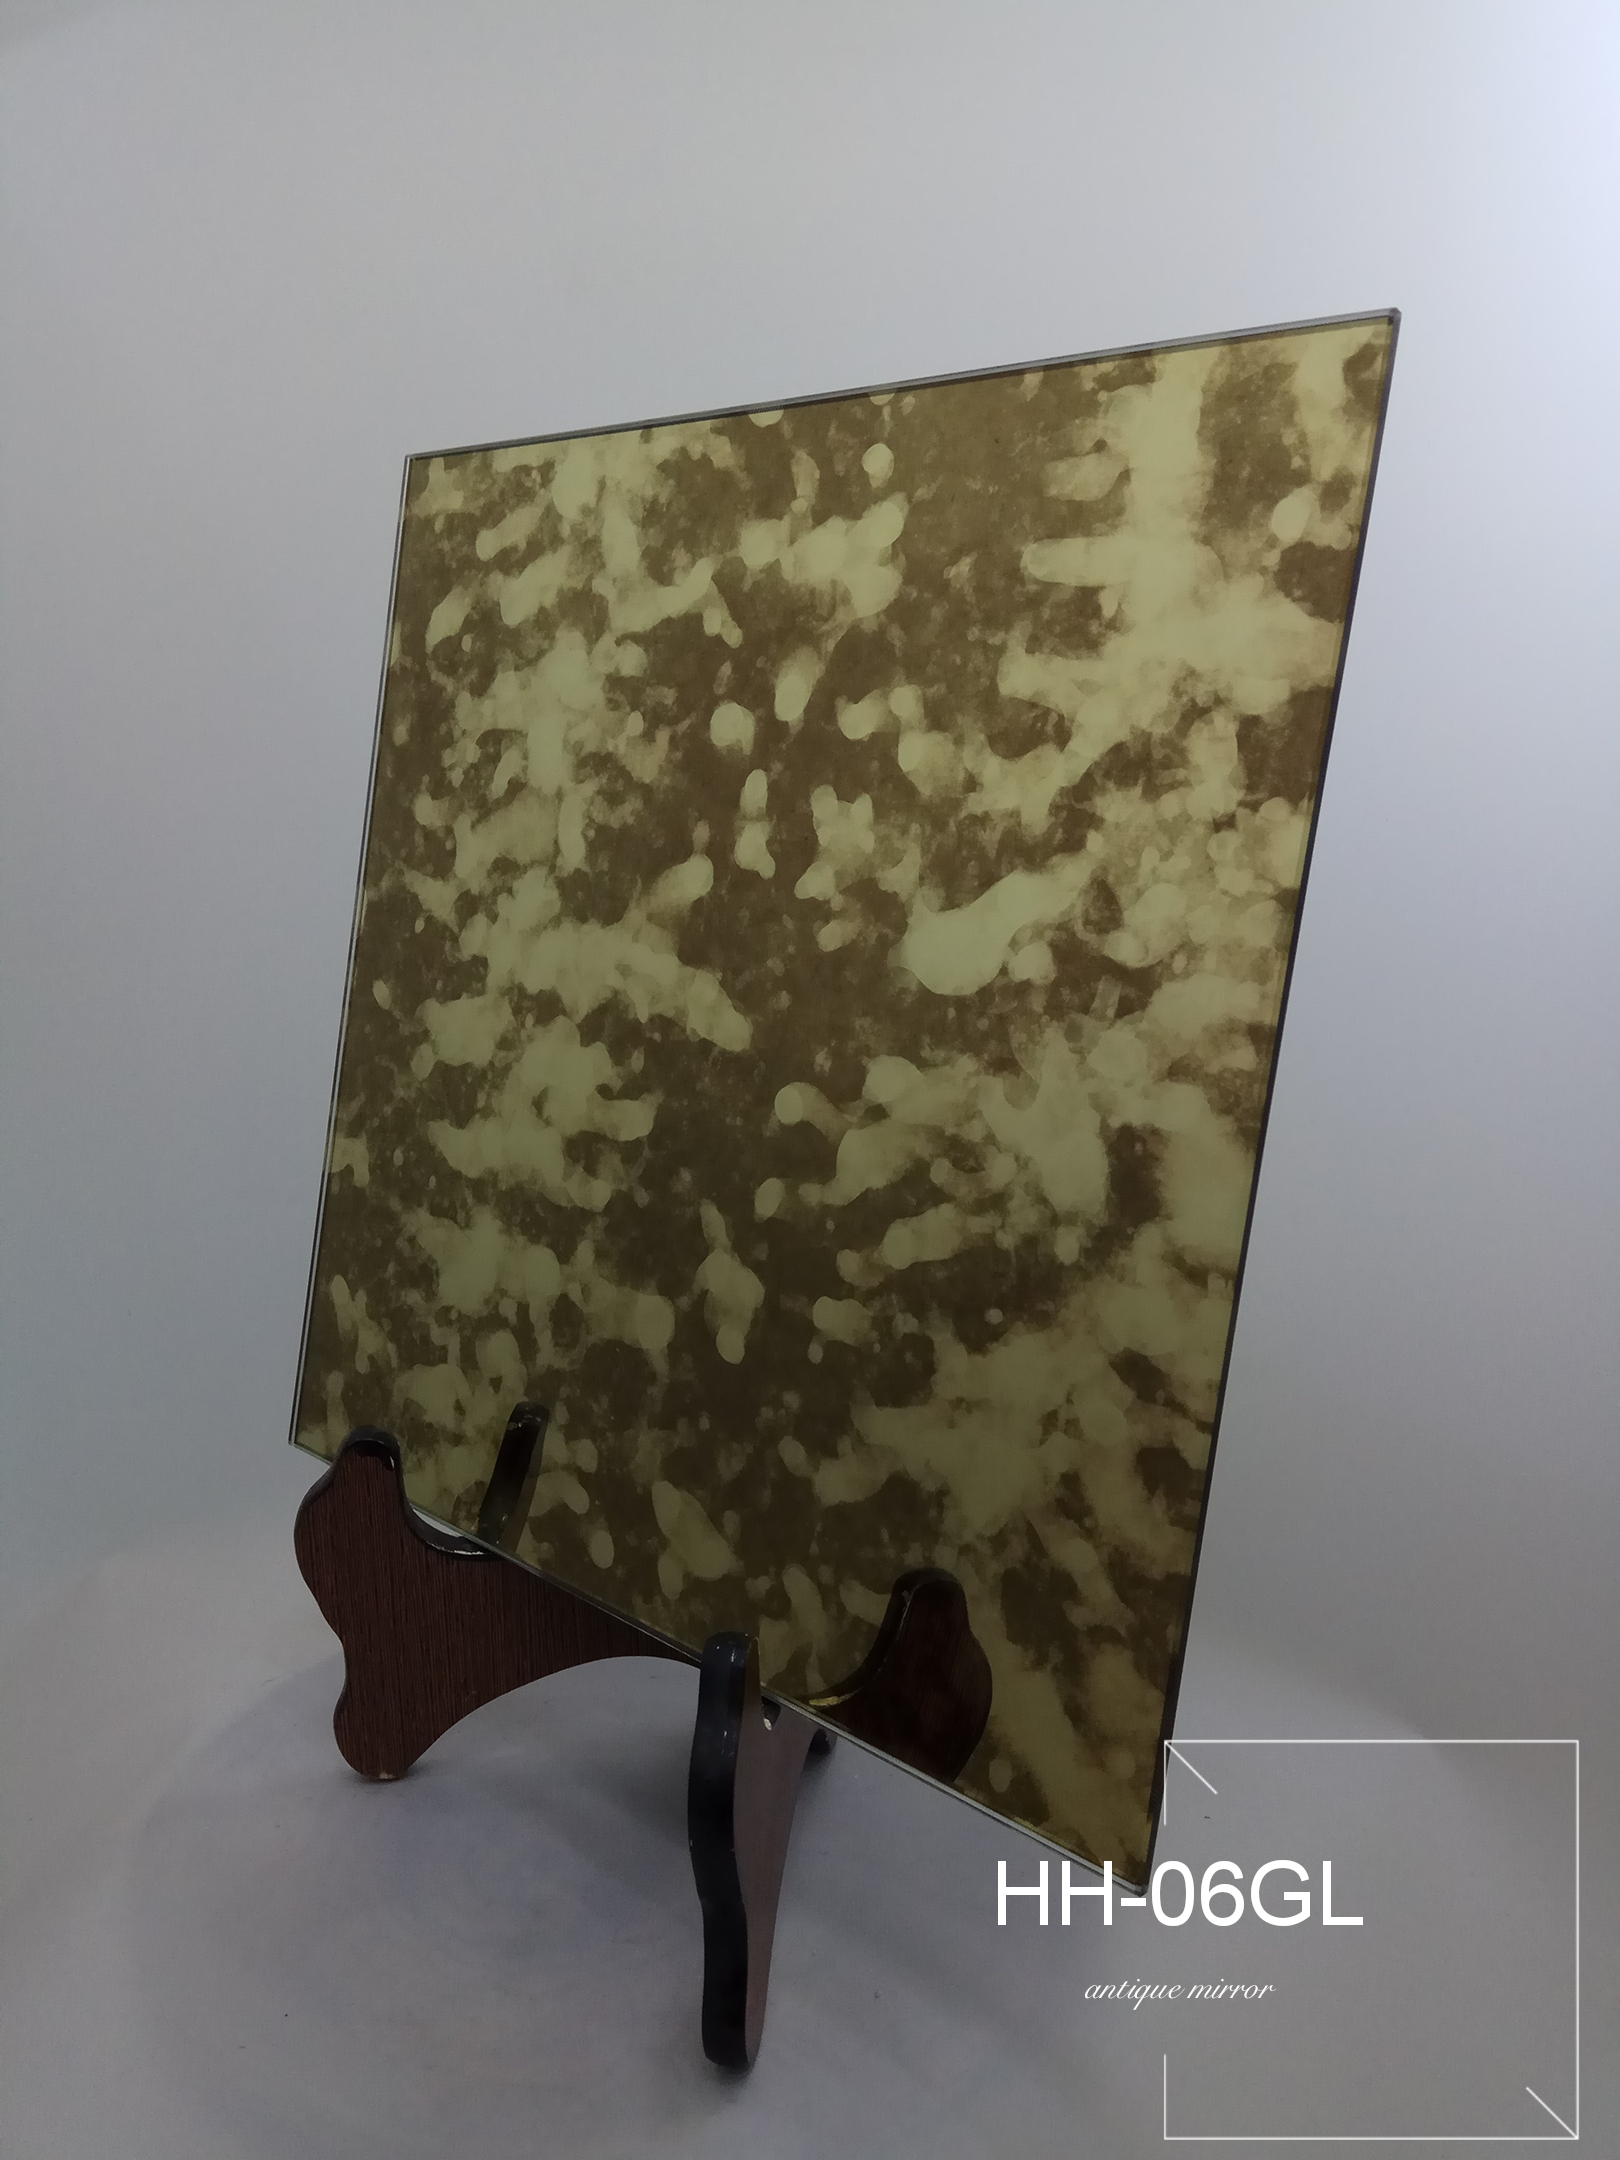 HH-06GL Antique Mirror/ Decorative Mirror